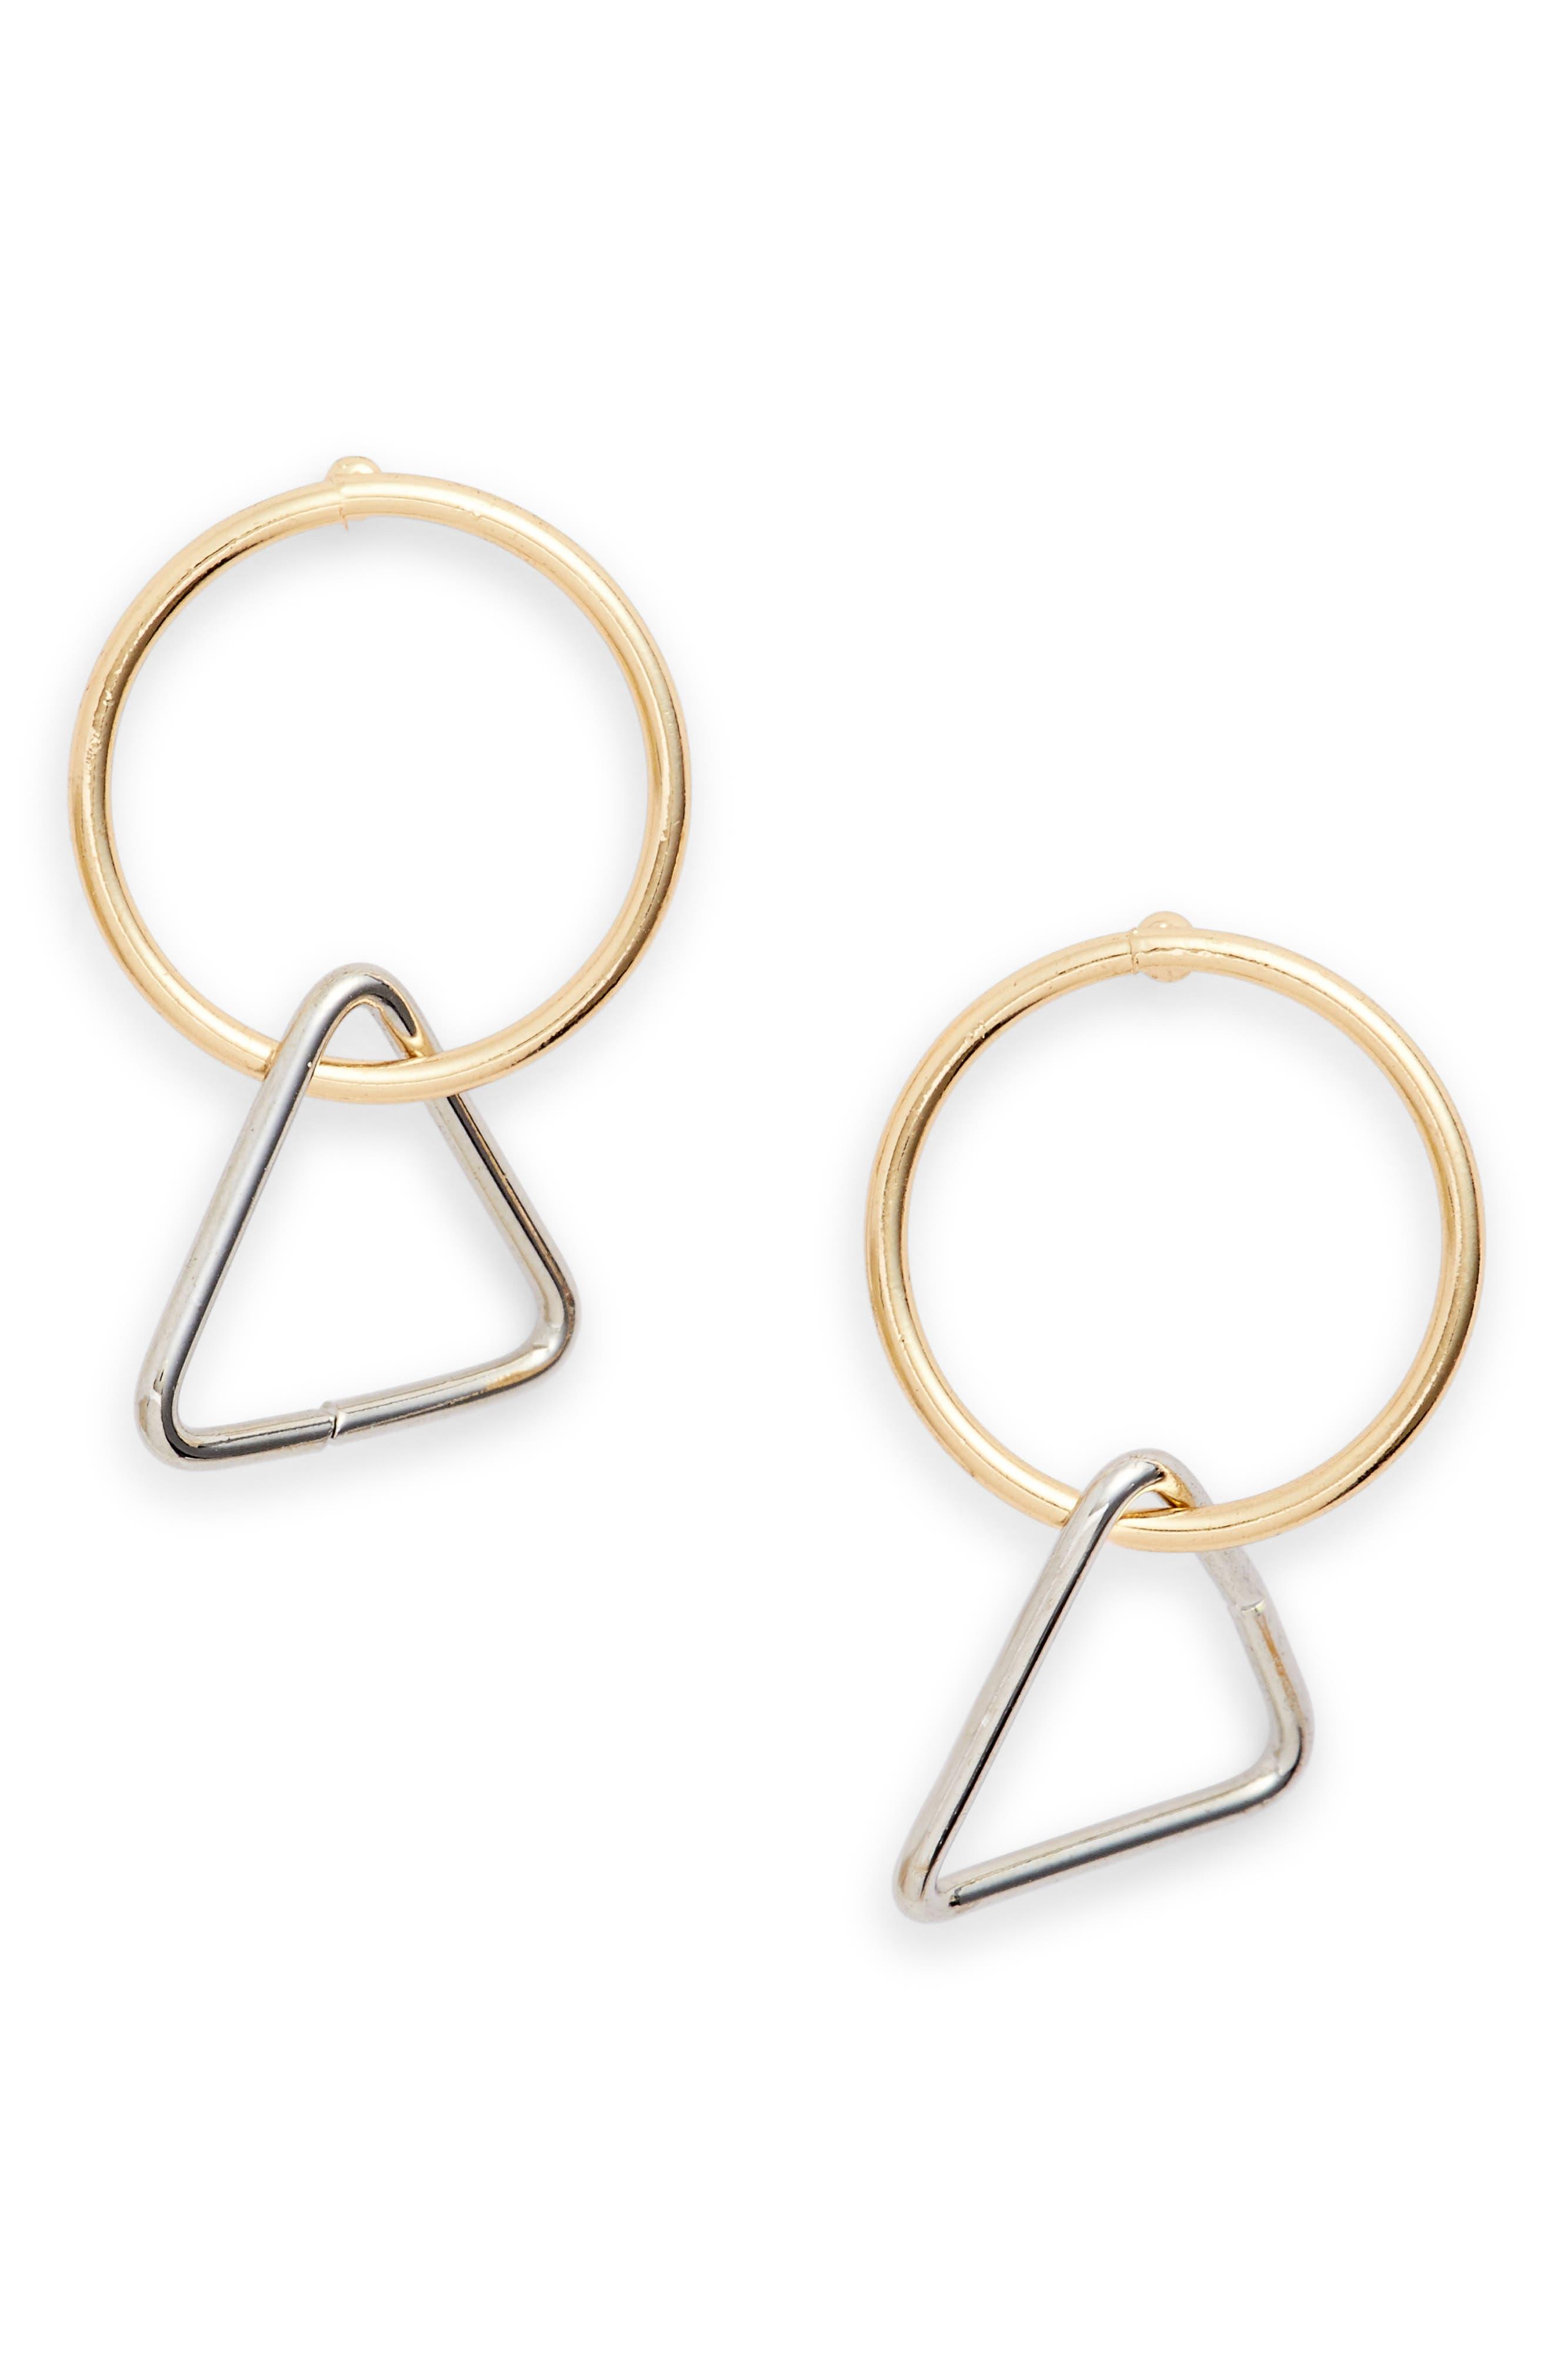 Mini Triangle Hoop Earrings,                             Main thumbnail 1, color,                             Gold/ Silver